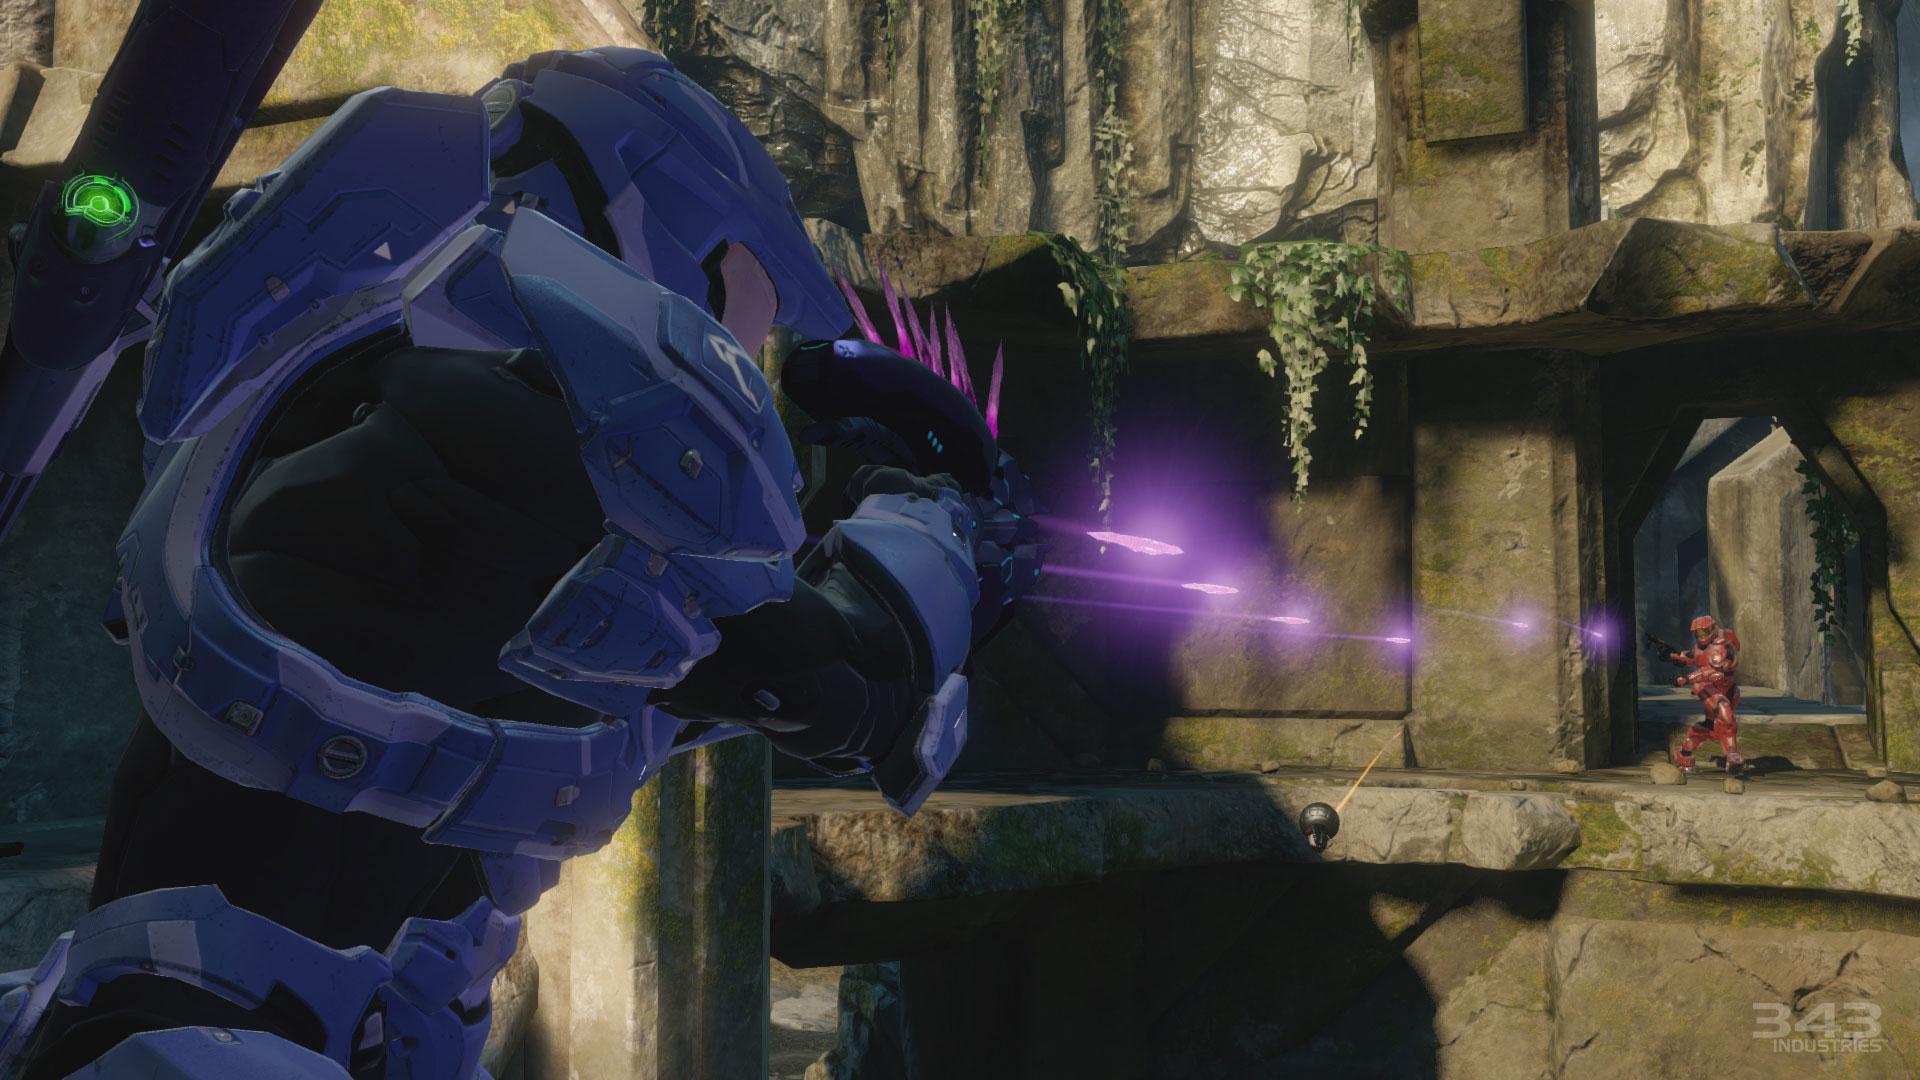 Xbox Live & Halo MCC issues - Microsoft Community